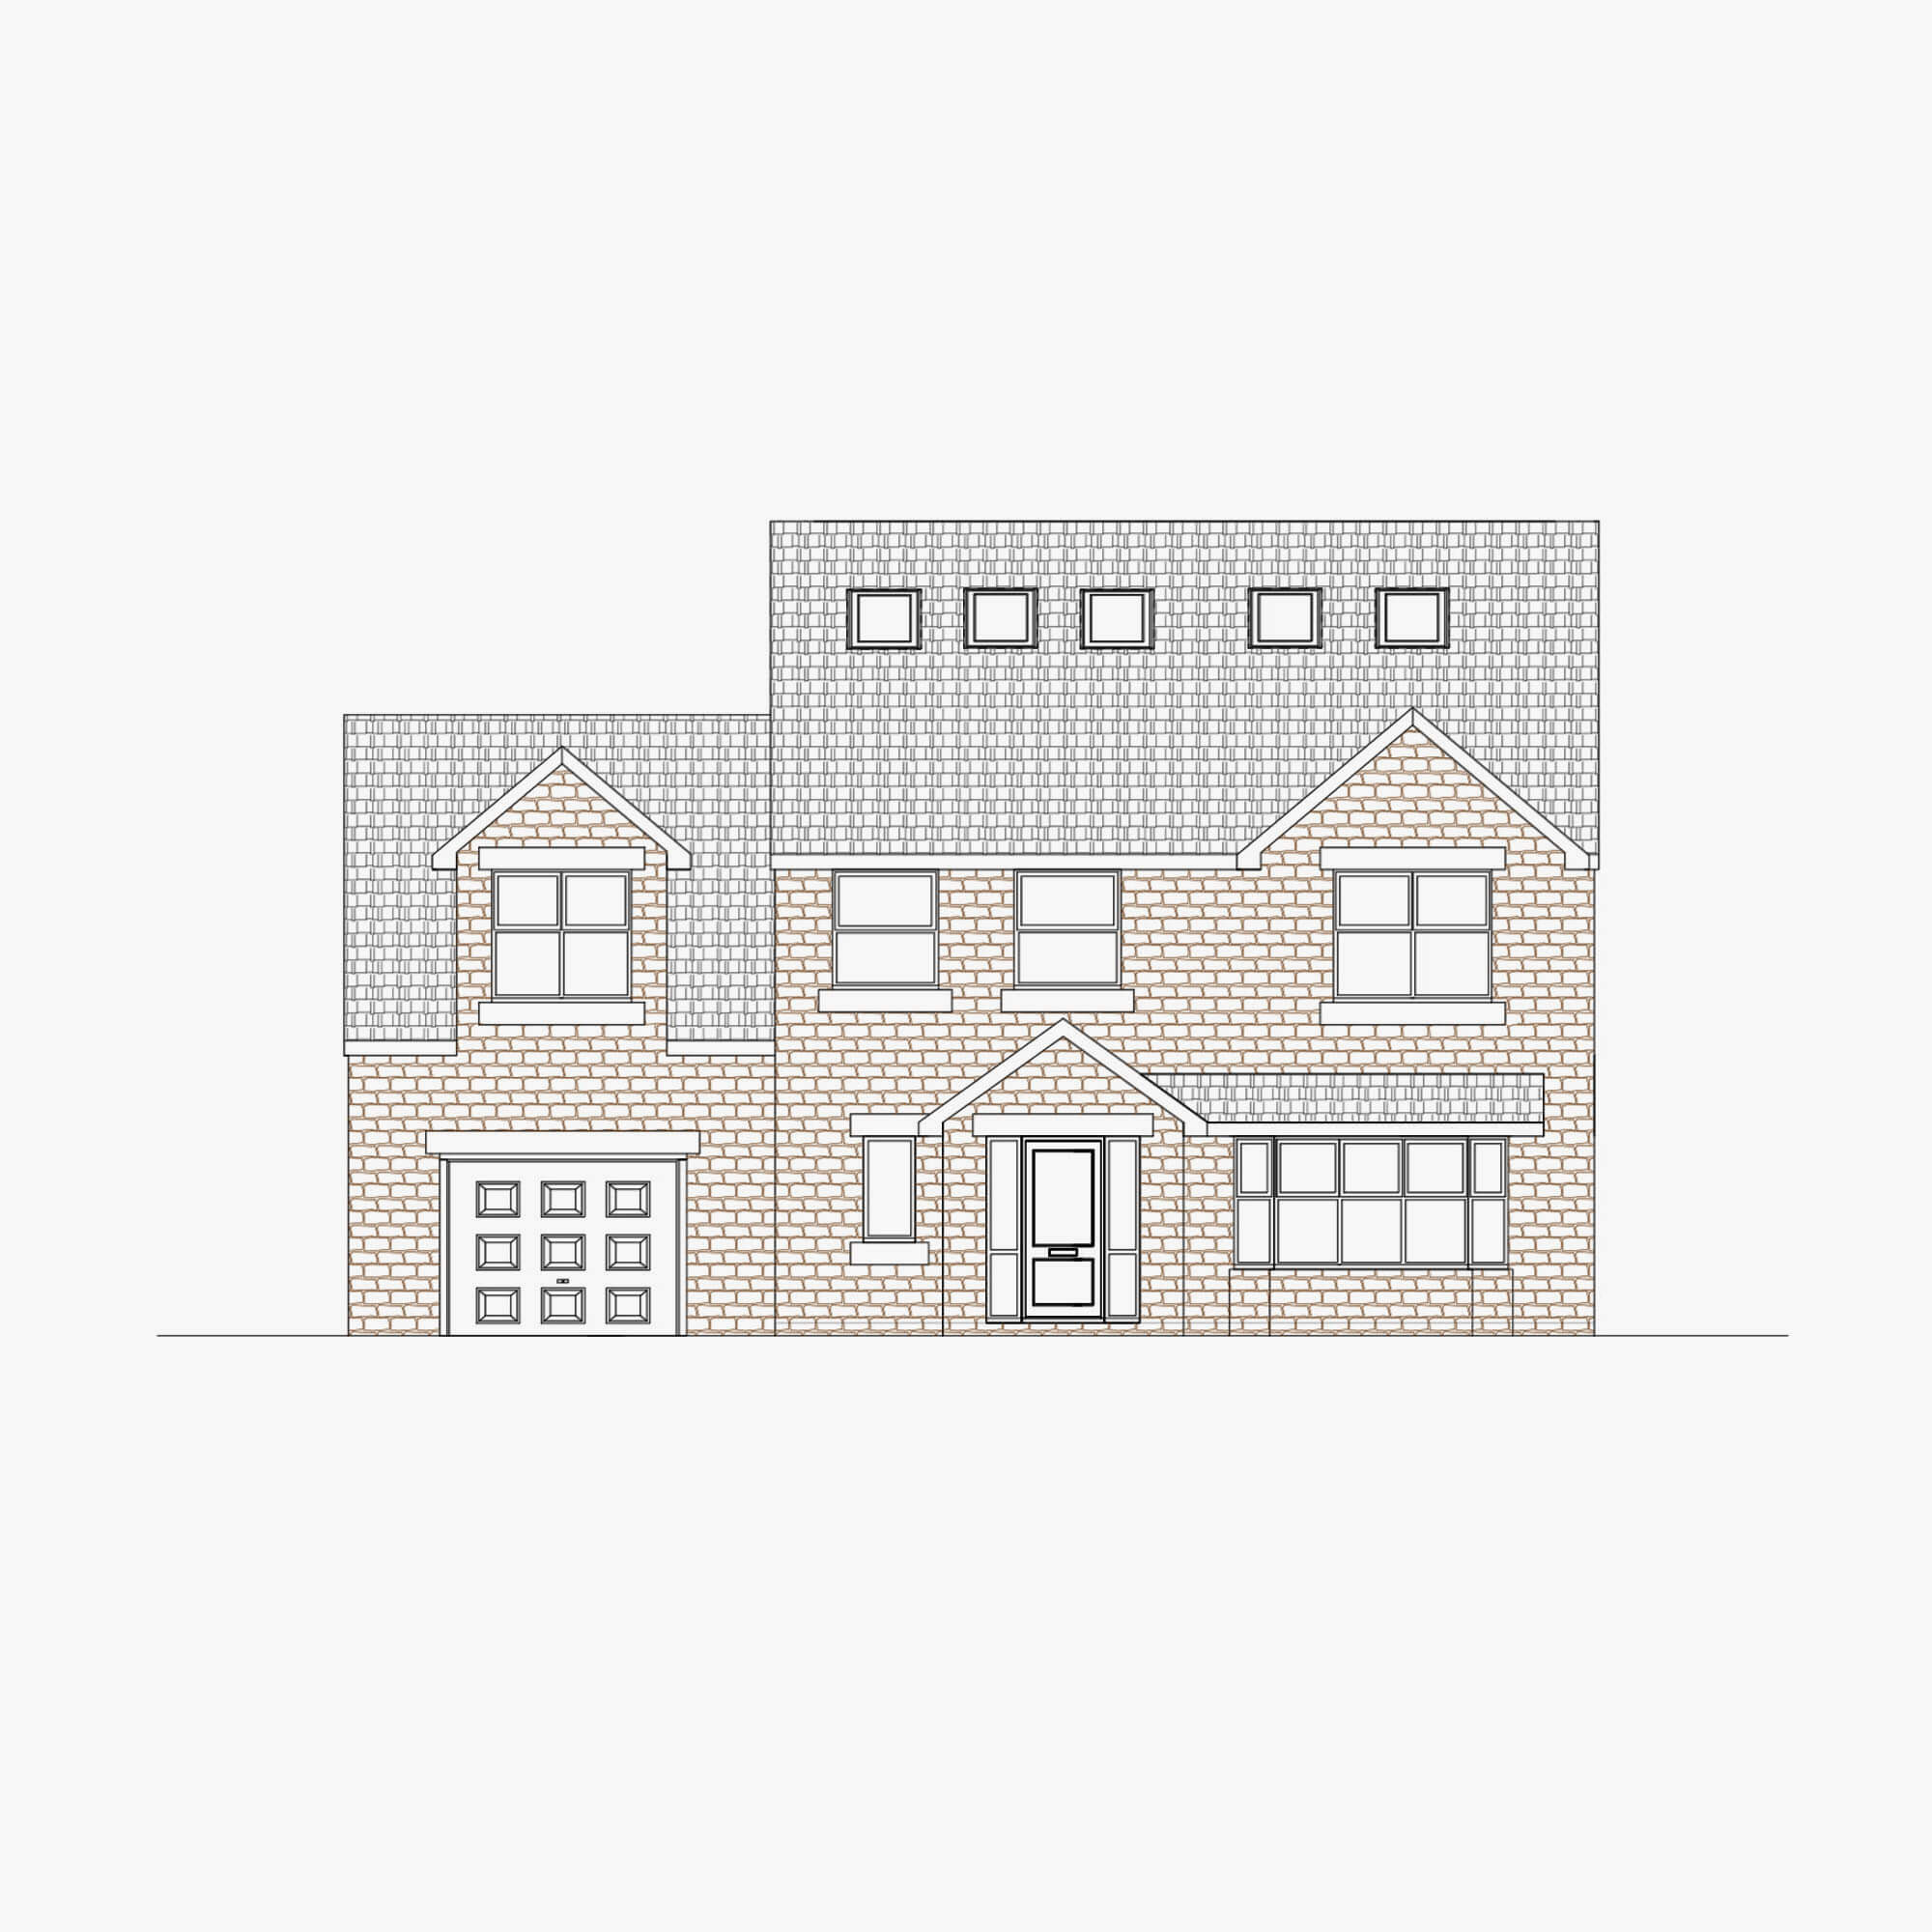 Eckington House Reconstruction